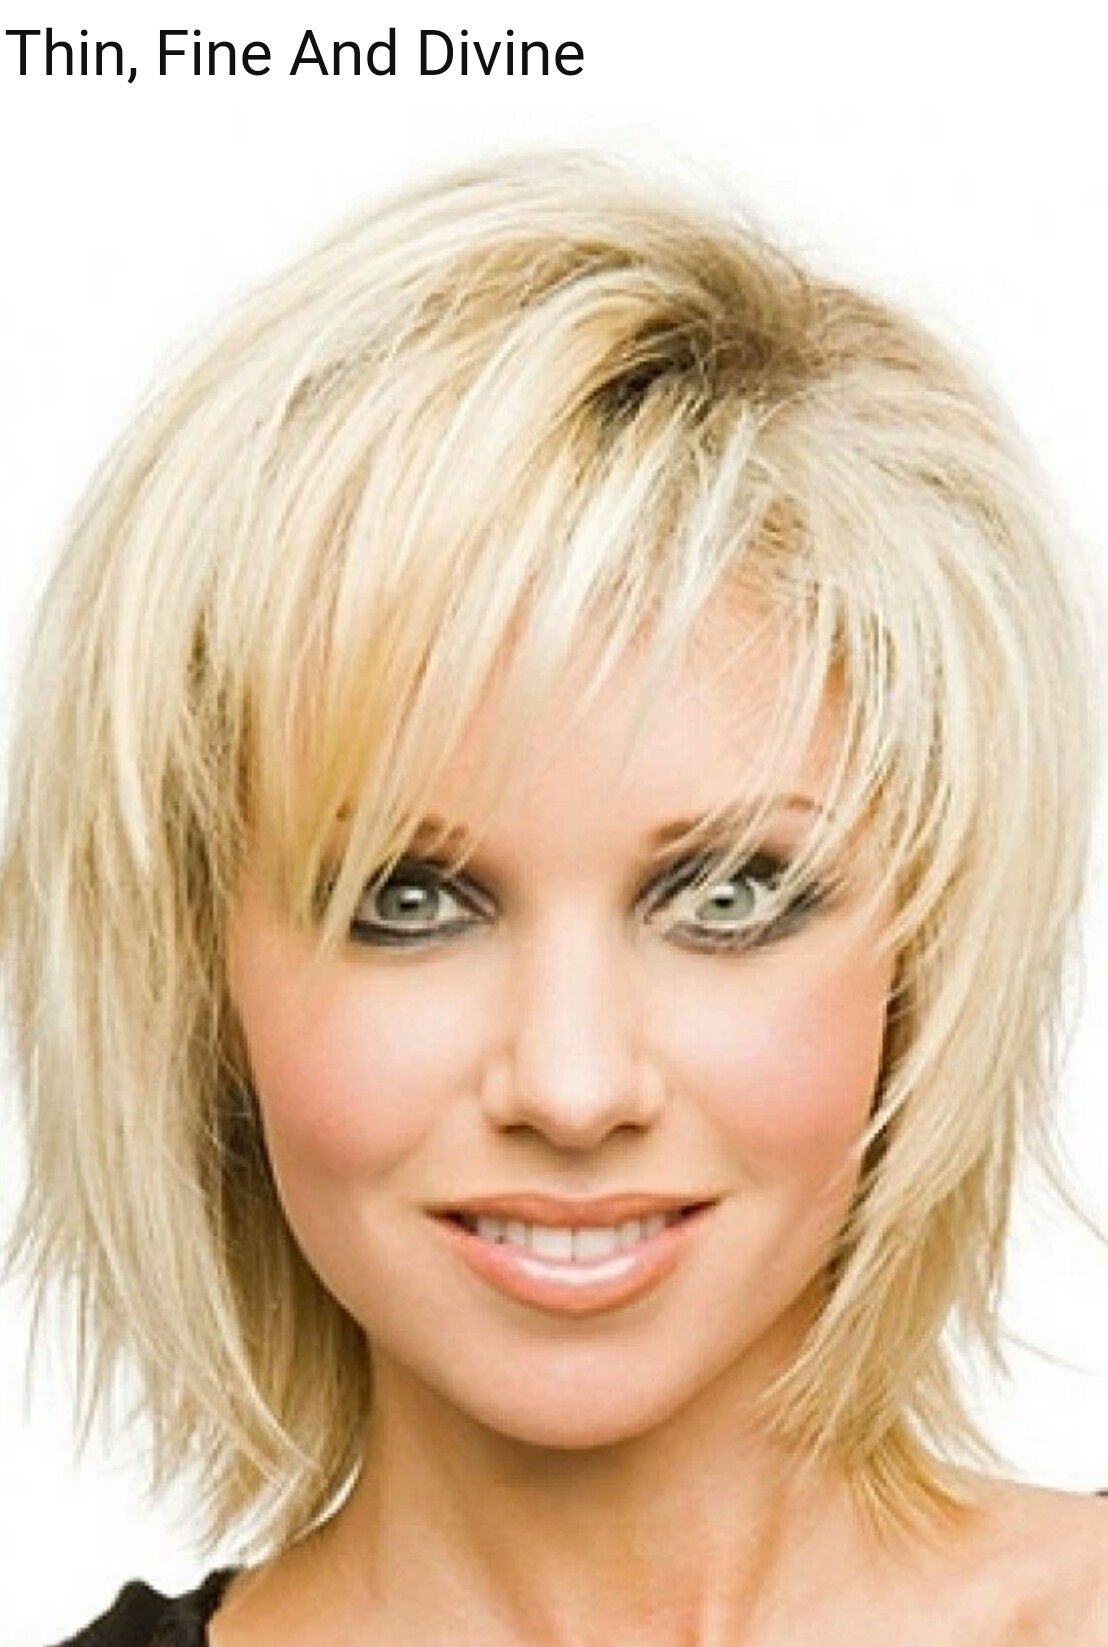 Pin by Dianne Longo Dejesus on hairstyles   Pinterest   Hair style ...